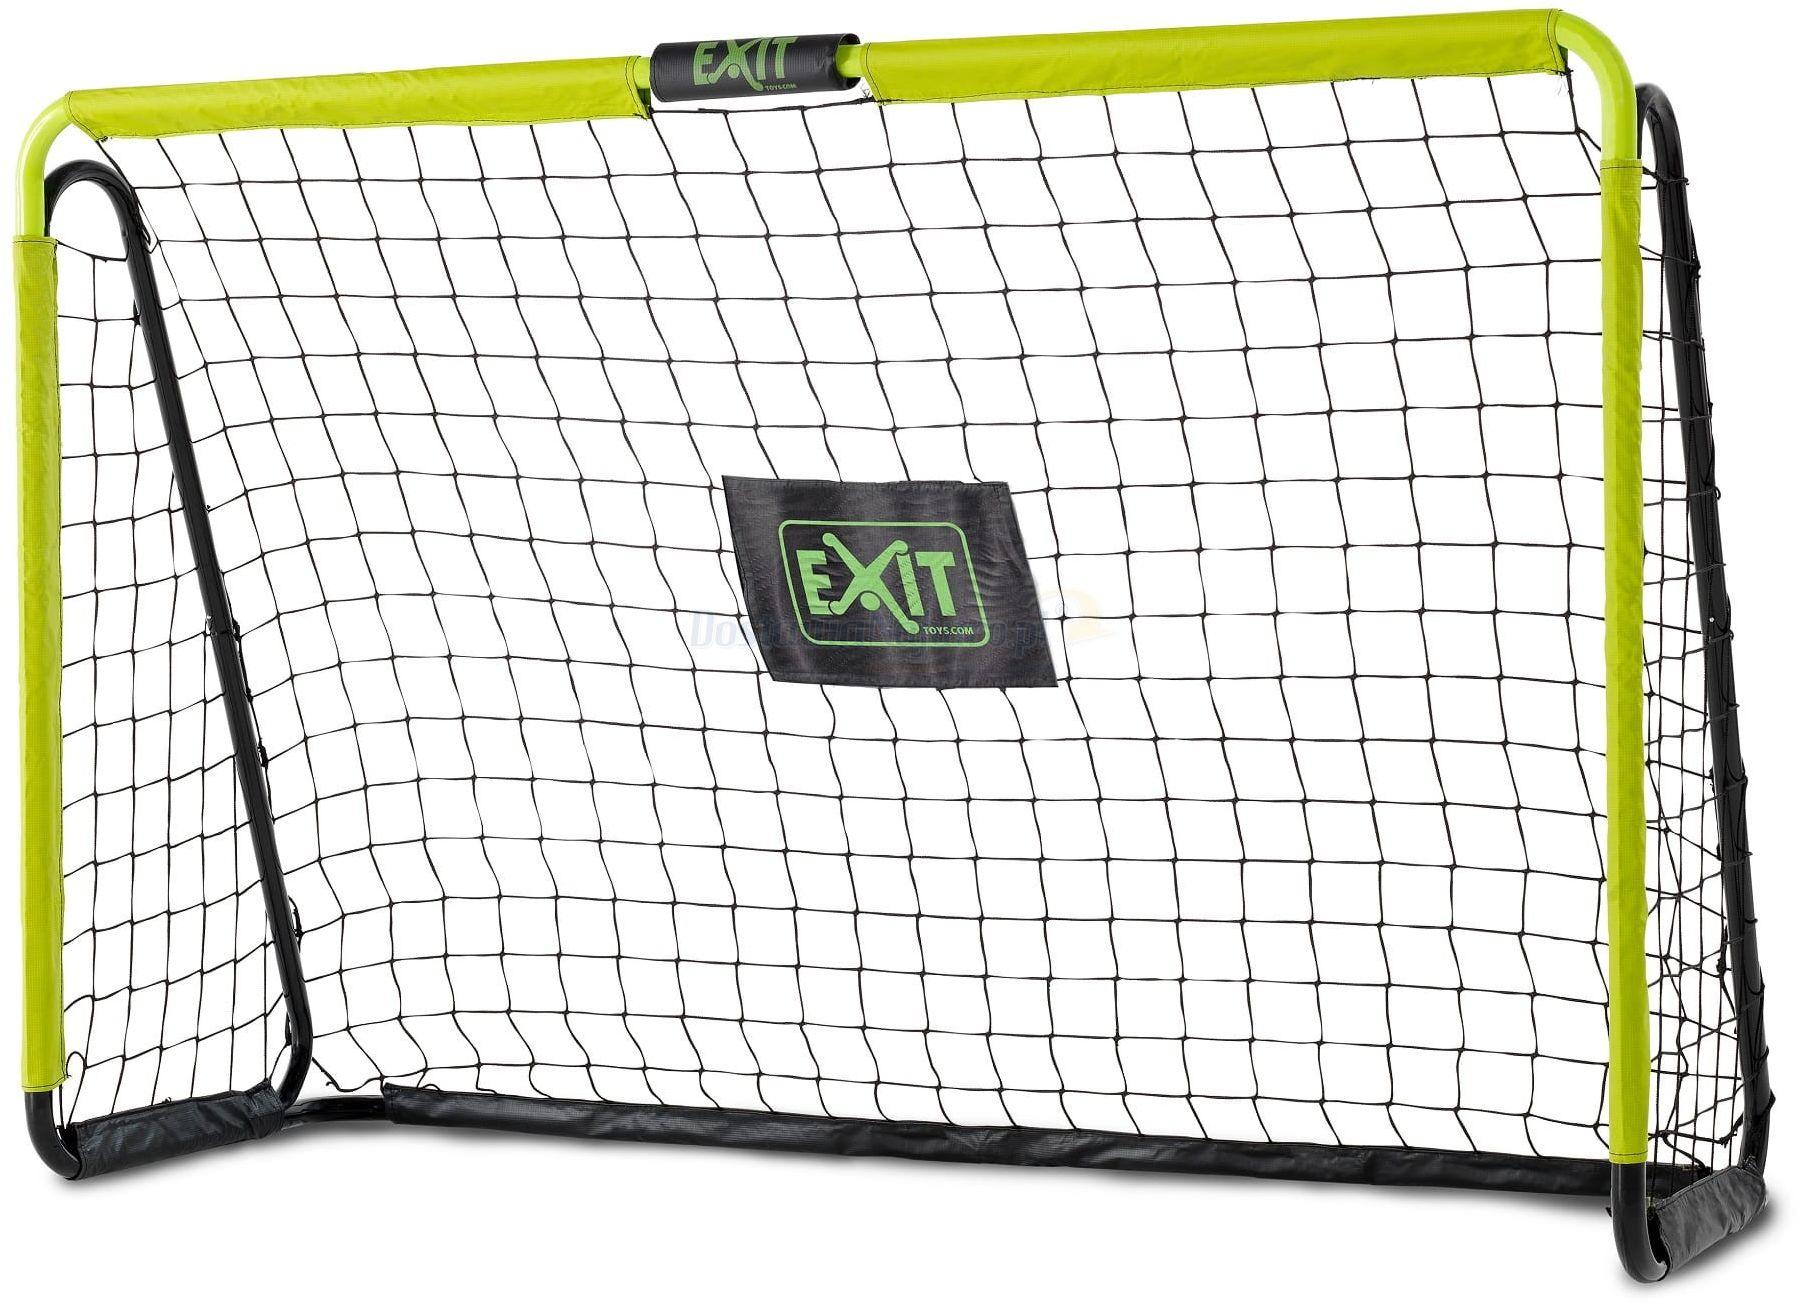 Bramka piłkarska Tempo Exit 300 x 200 cm ocynk mocna 28 kg